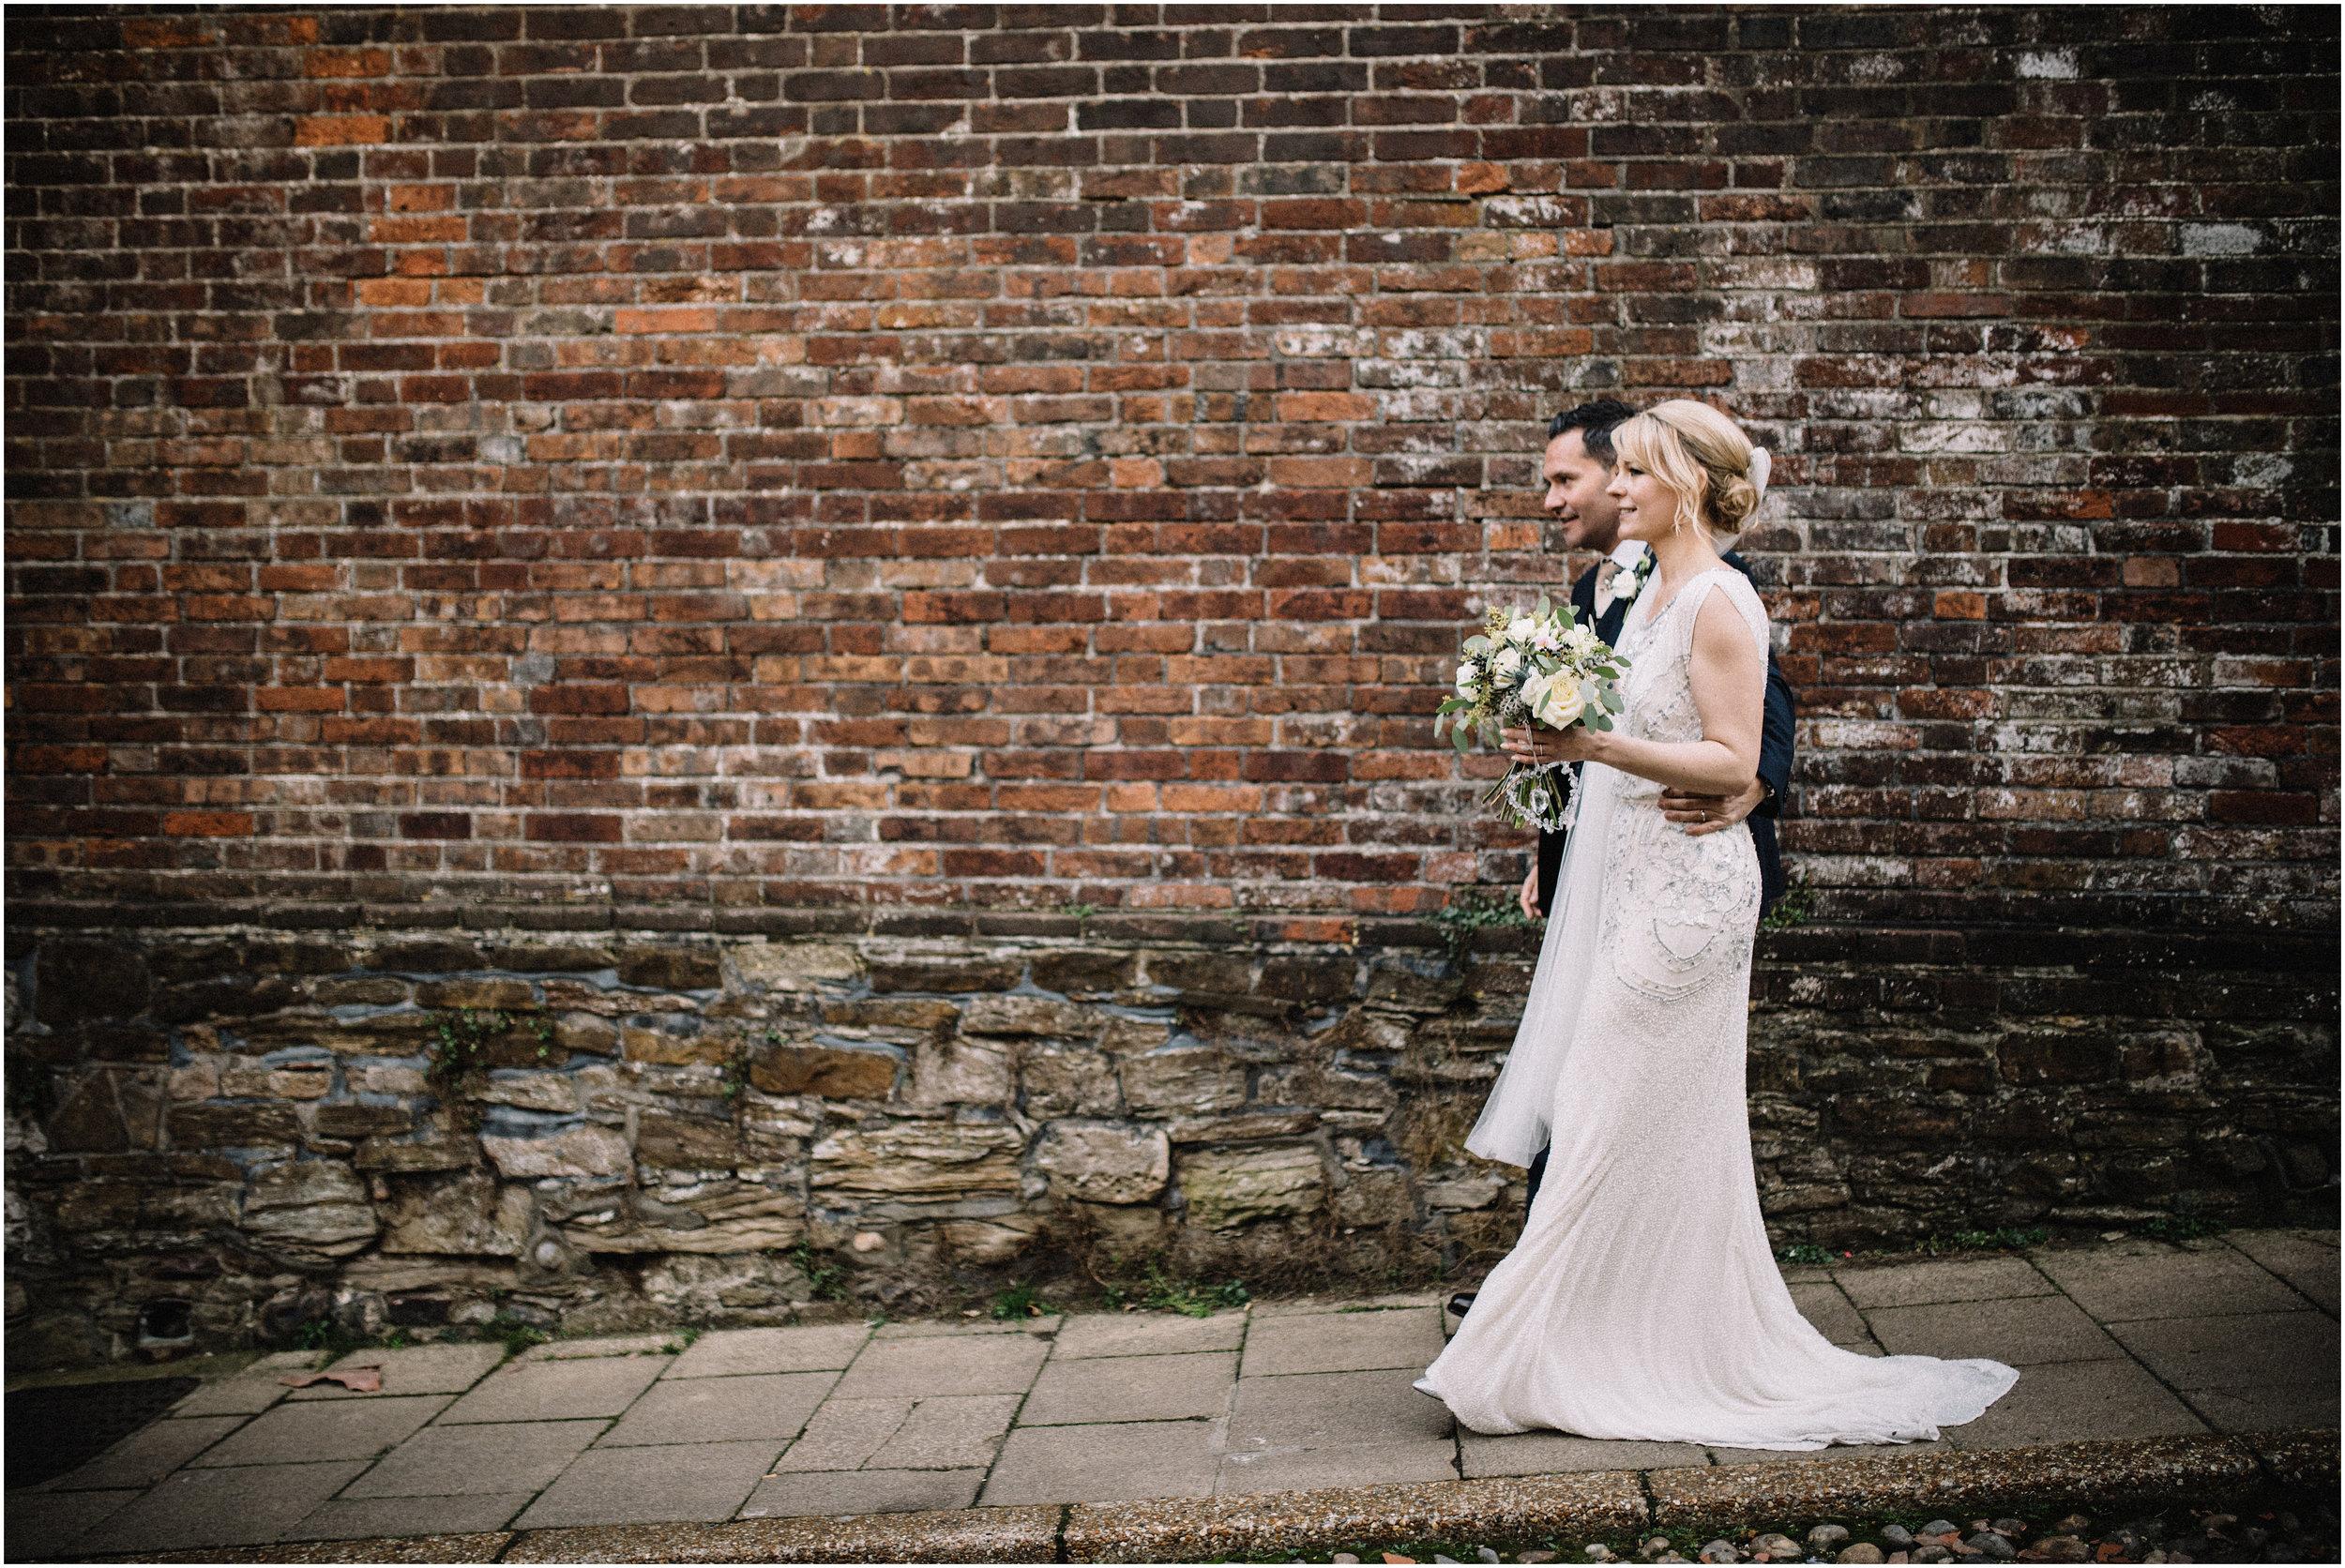 George in Rye Wedding Photographer-49.jpg